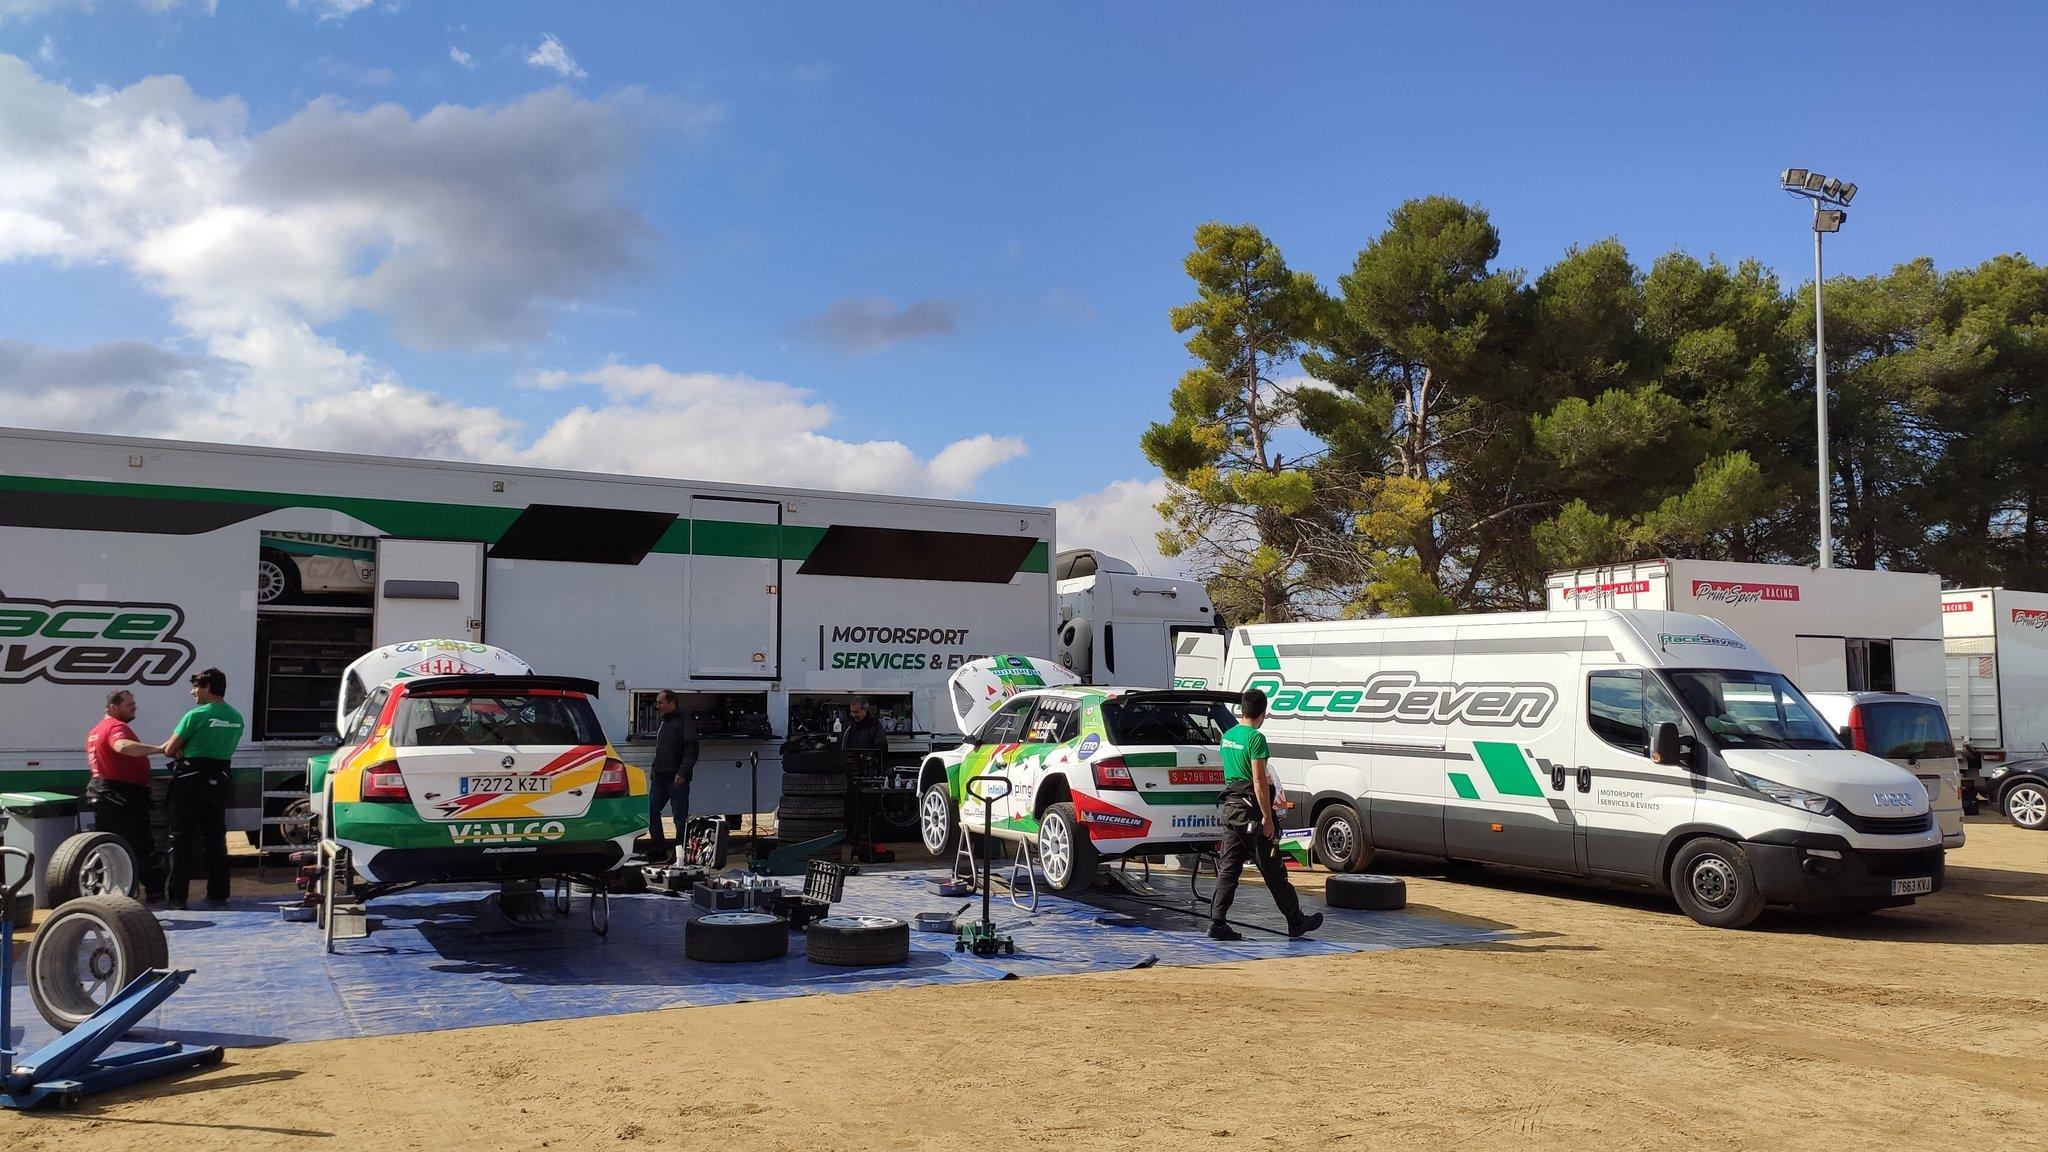 WRC: 55º RallyRACC Catalunya - Costa Daurada - Rally de España [24-27 Octubre] - Página 2 EHZvaTMW4AEY7ke?format=jpg&name=4096x4096